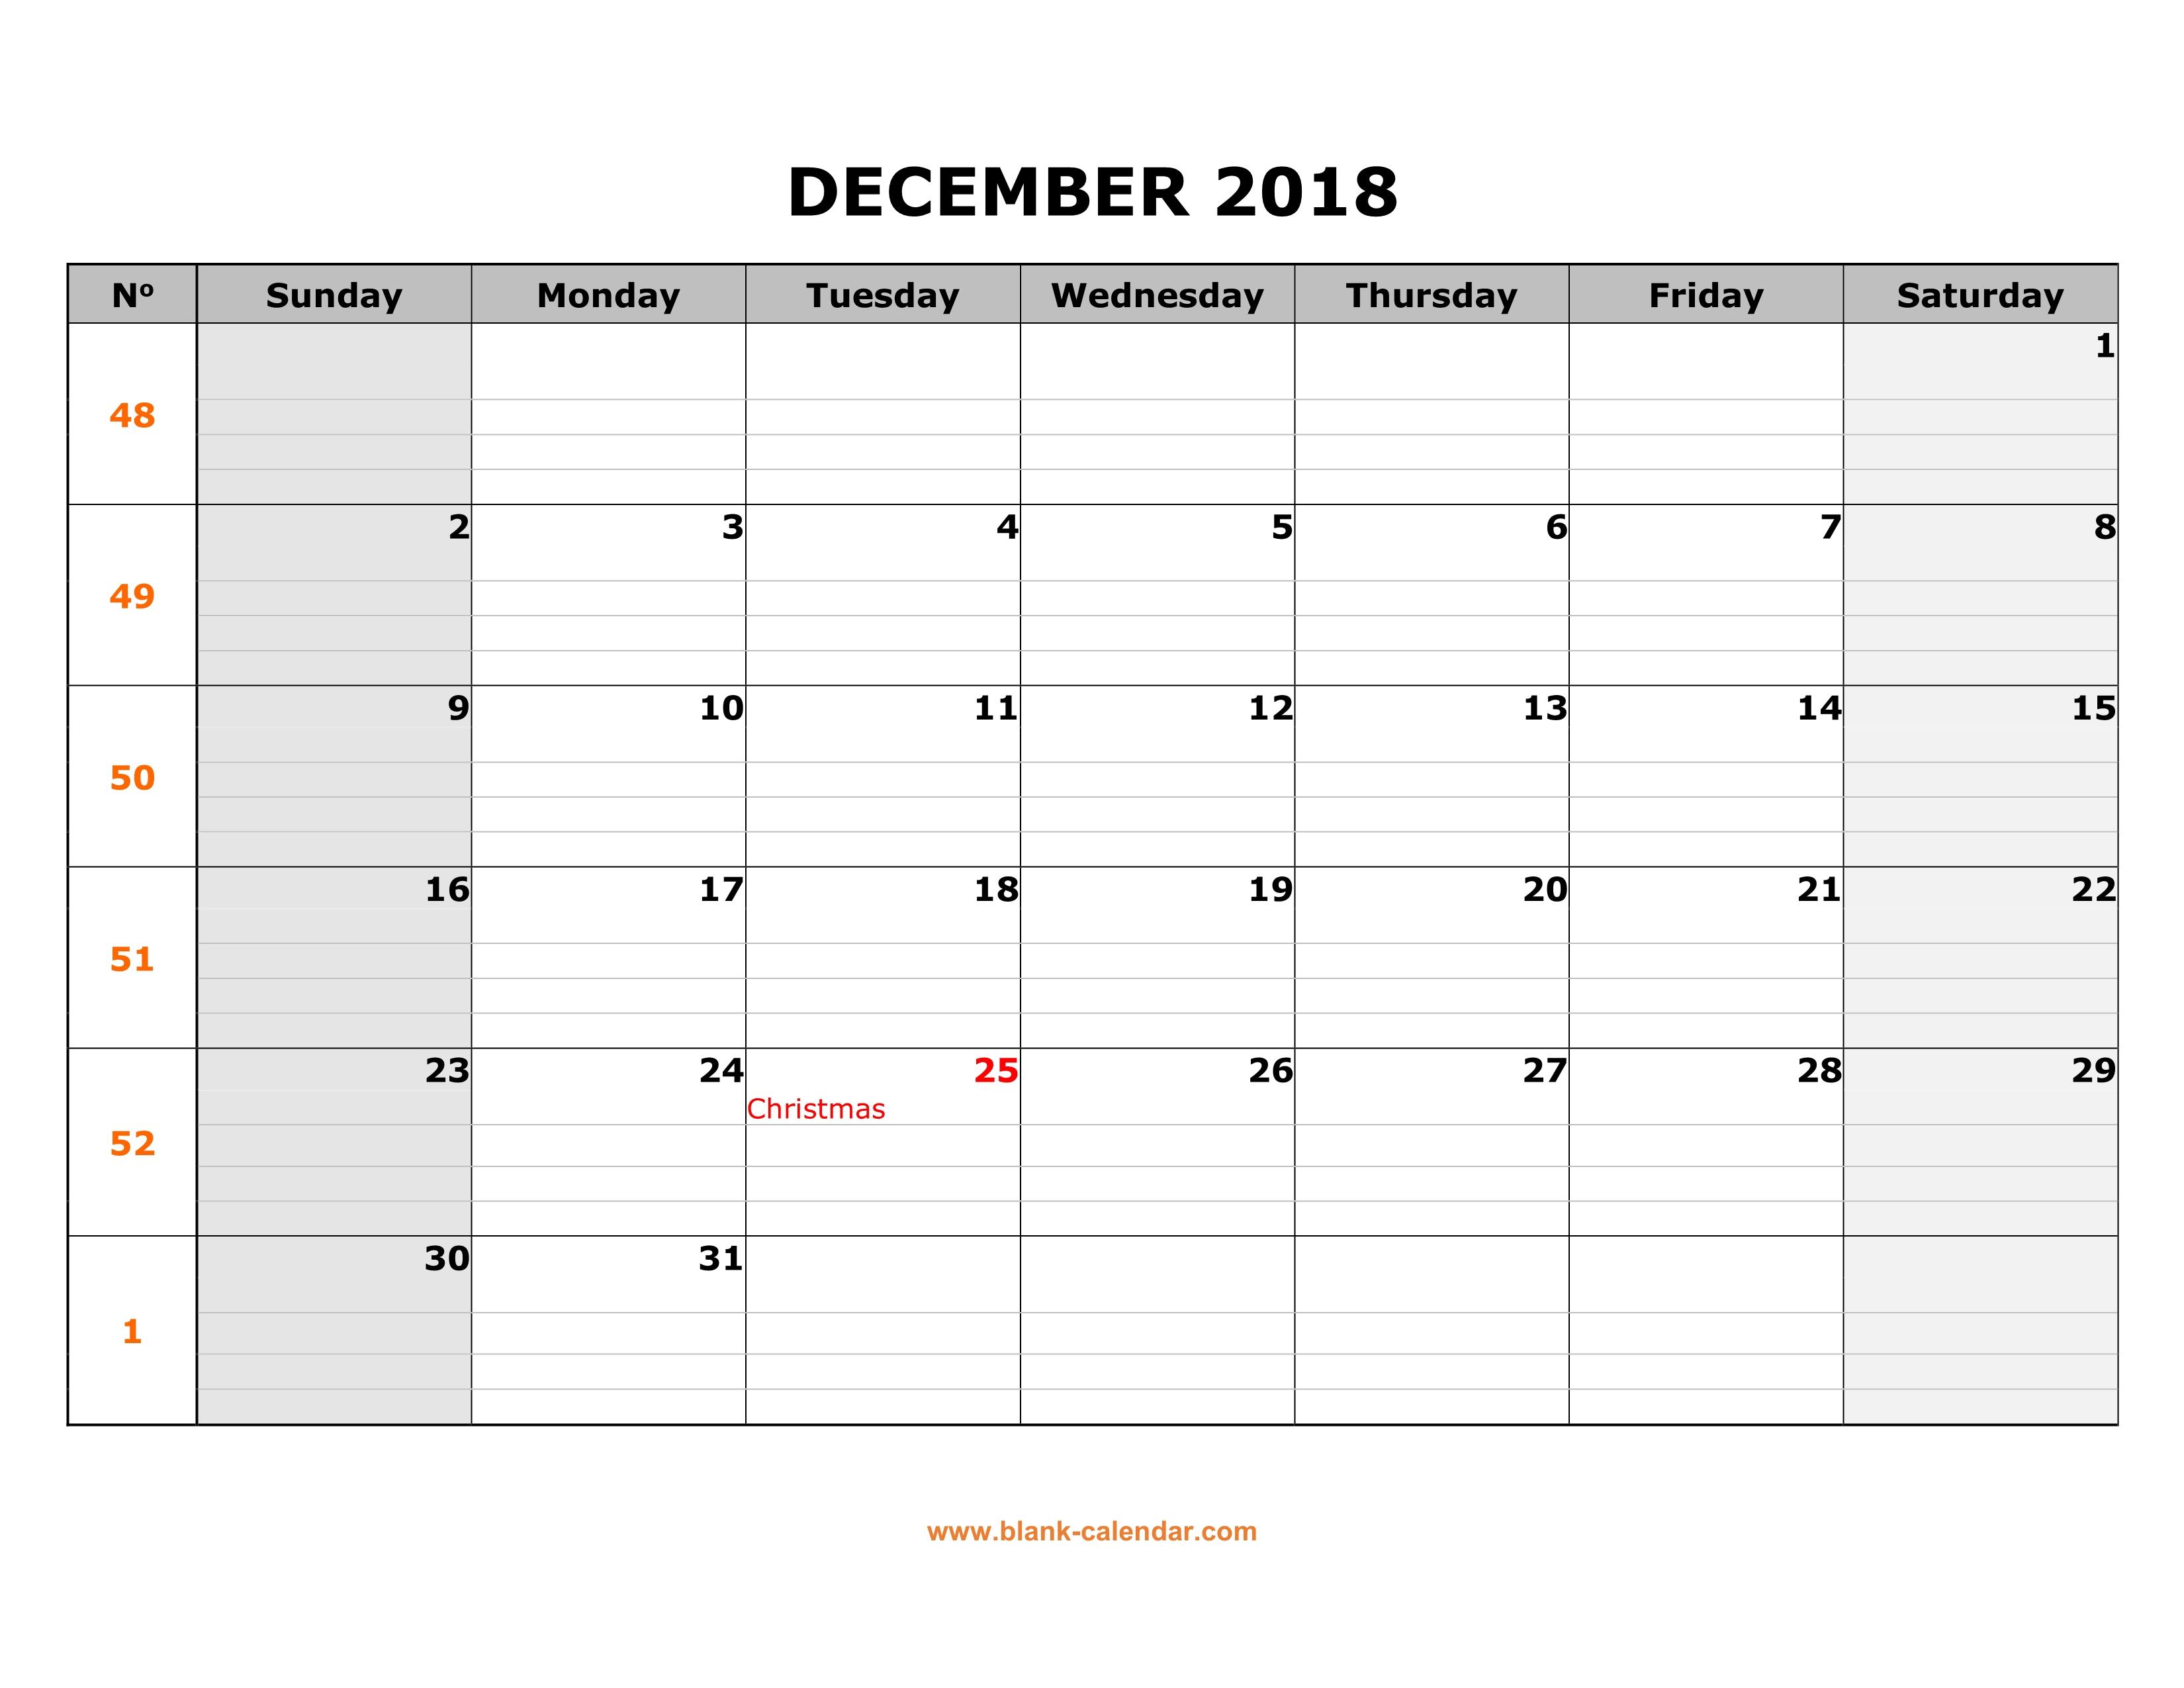 Free Download Printable December 2018 Calendar, Large Box Grid in Blank Dec Calendar Printable